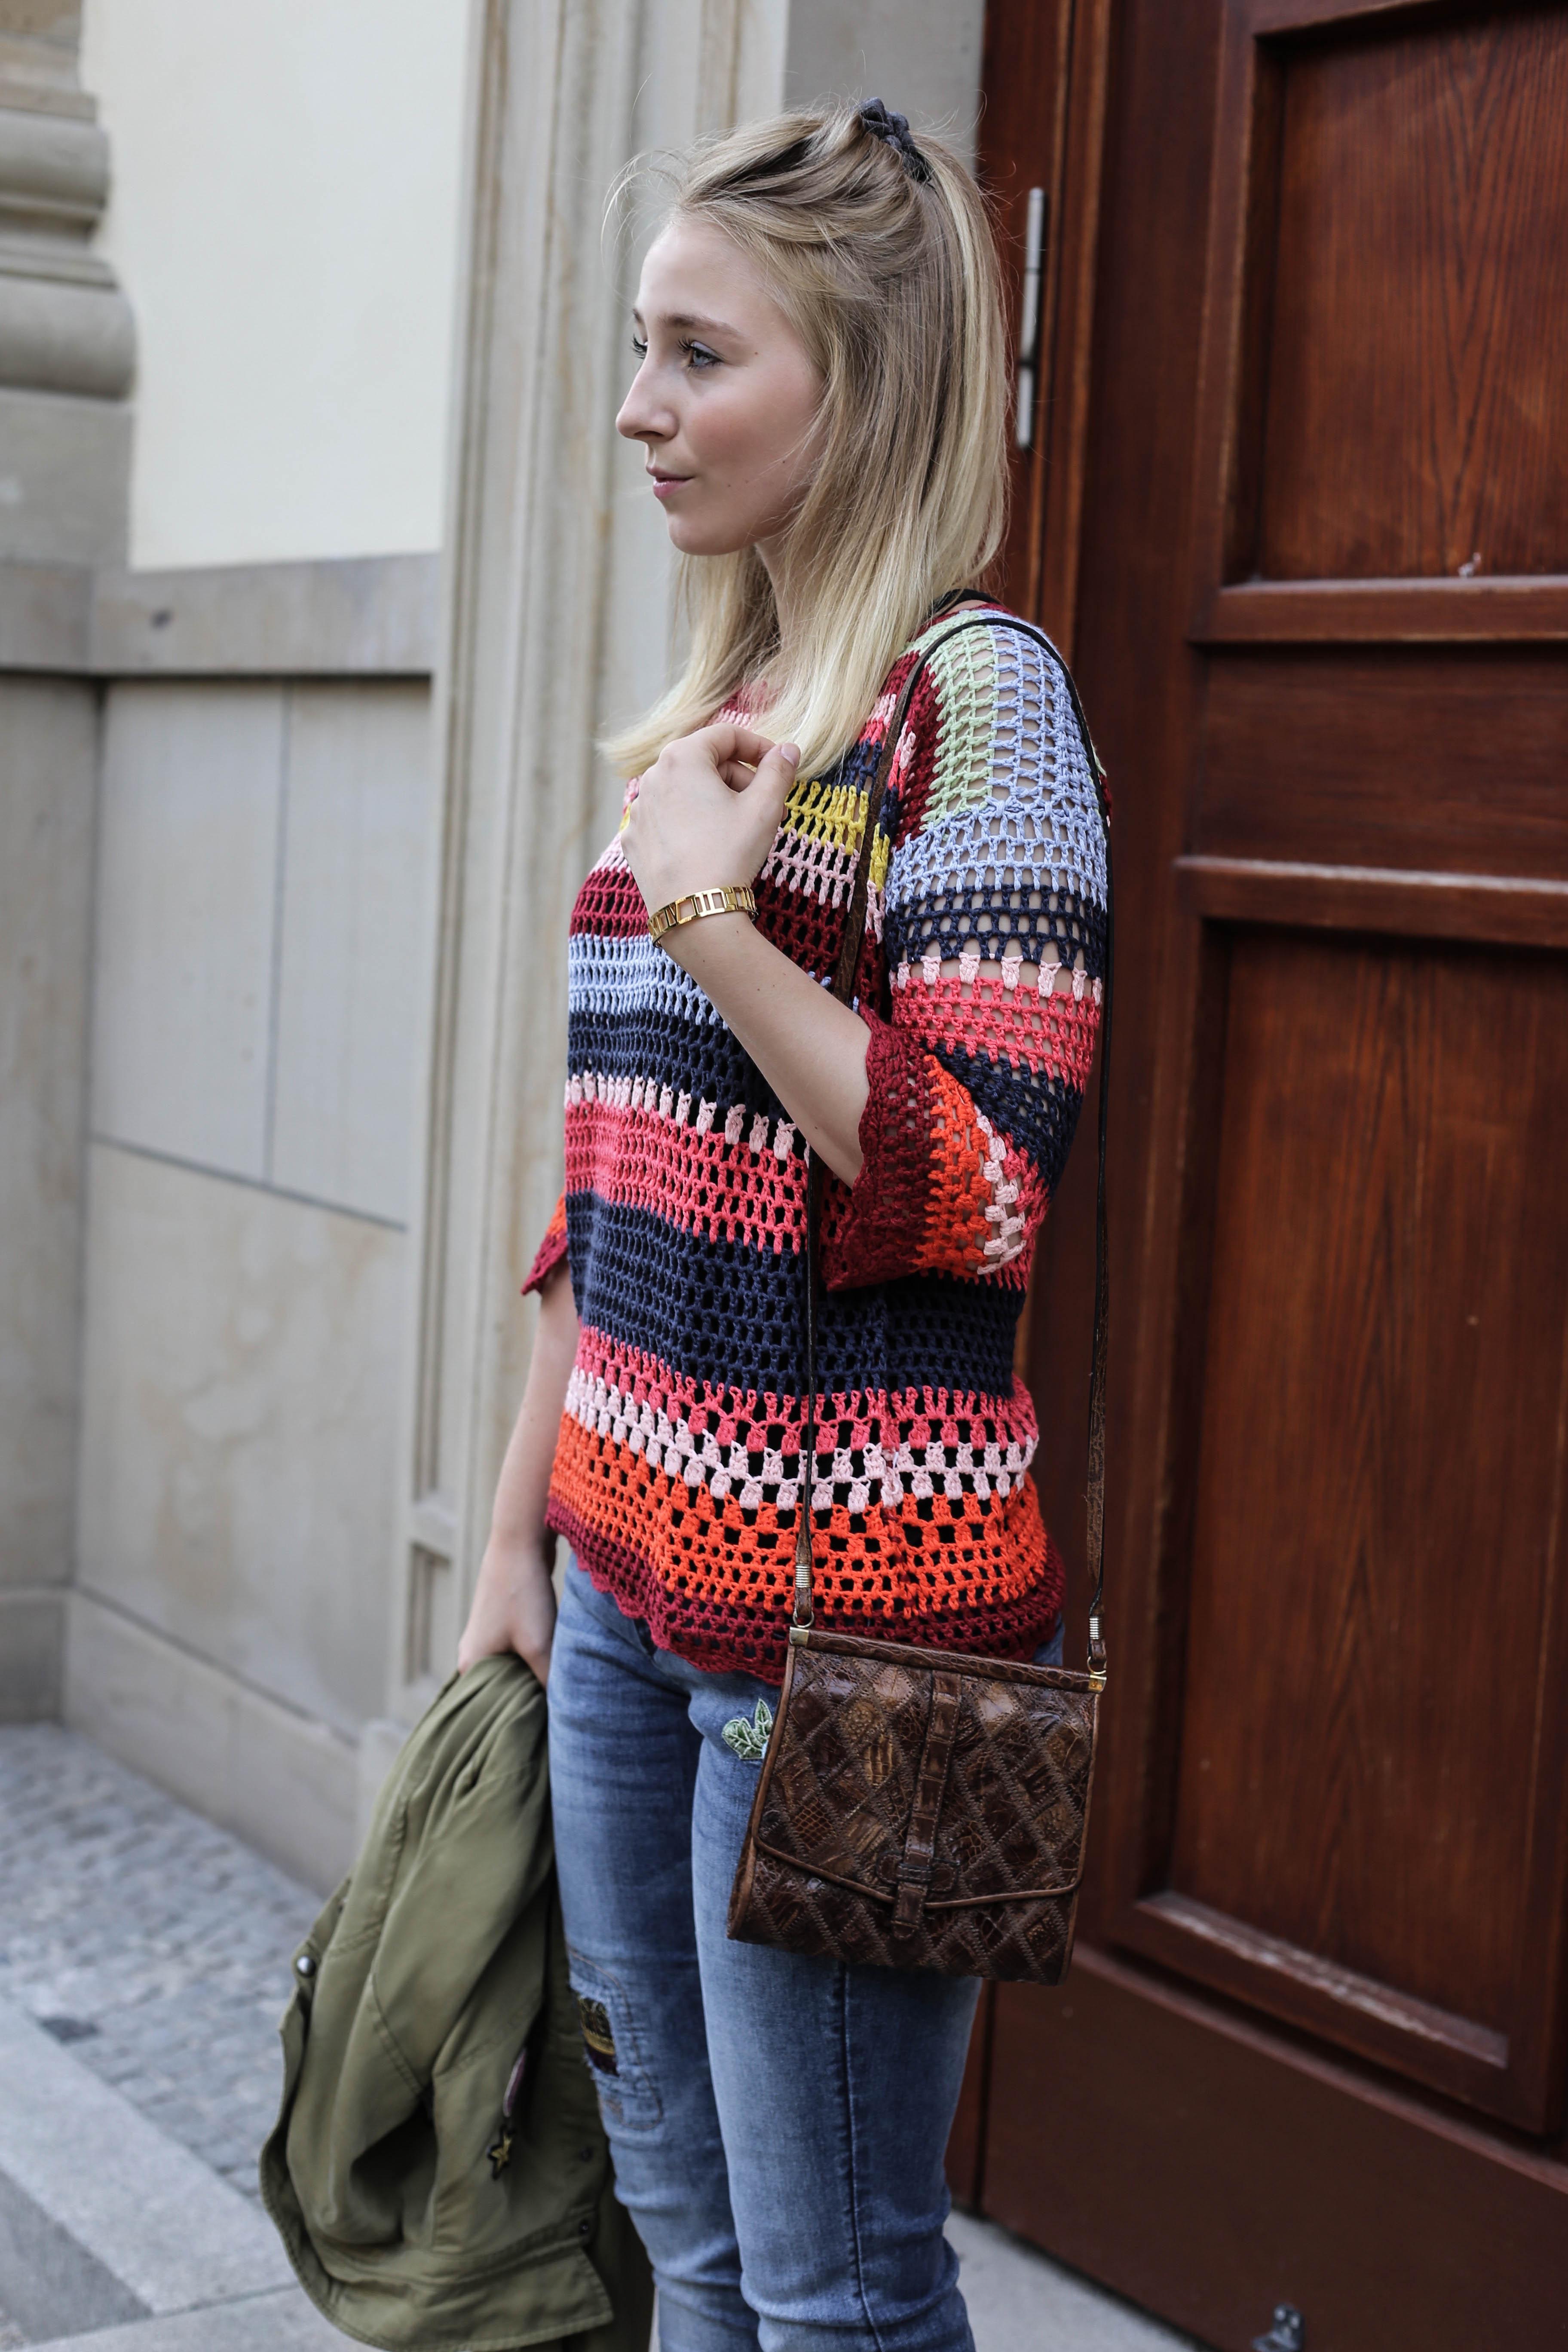 spaetsommer-look-desigual-bunt-alltag-fashionblog-modeblog-berlin_4015